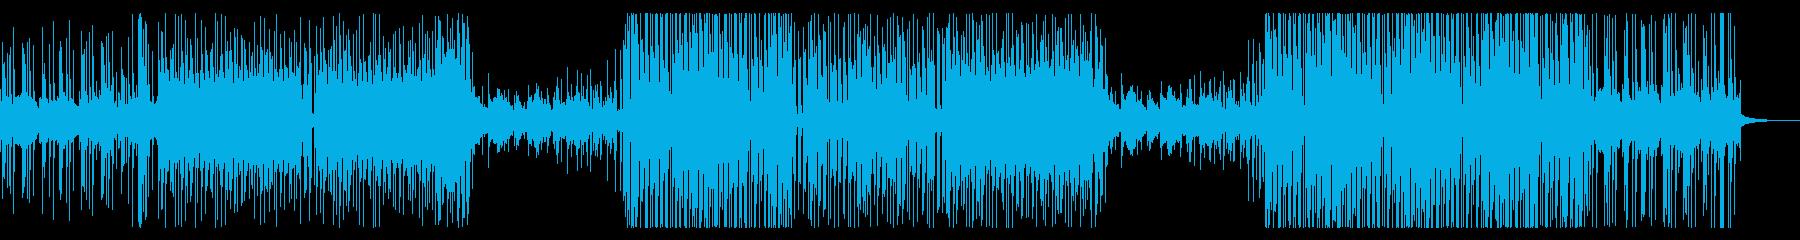 Varaderoの再生済みの波形